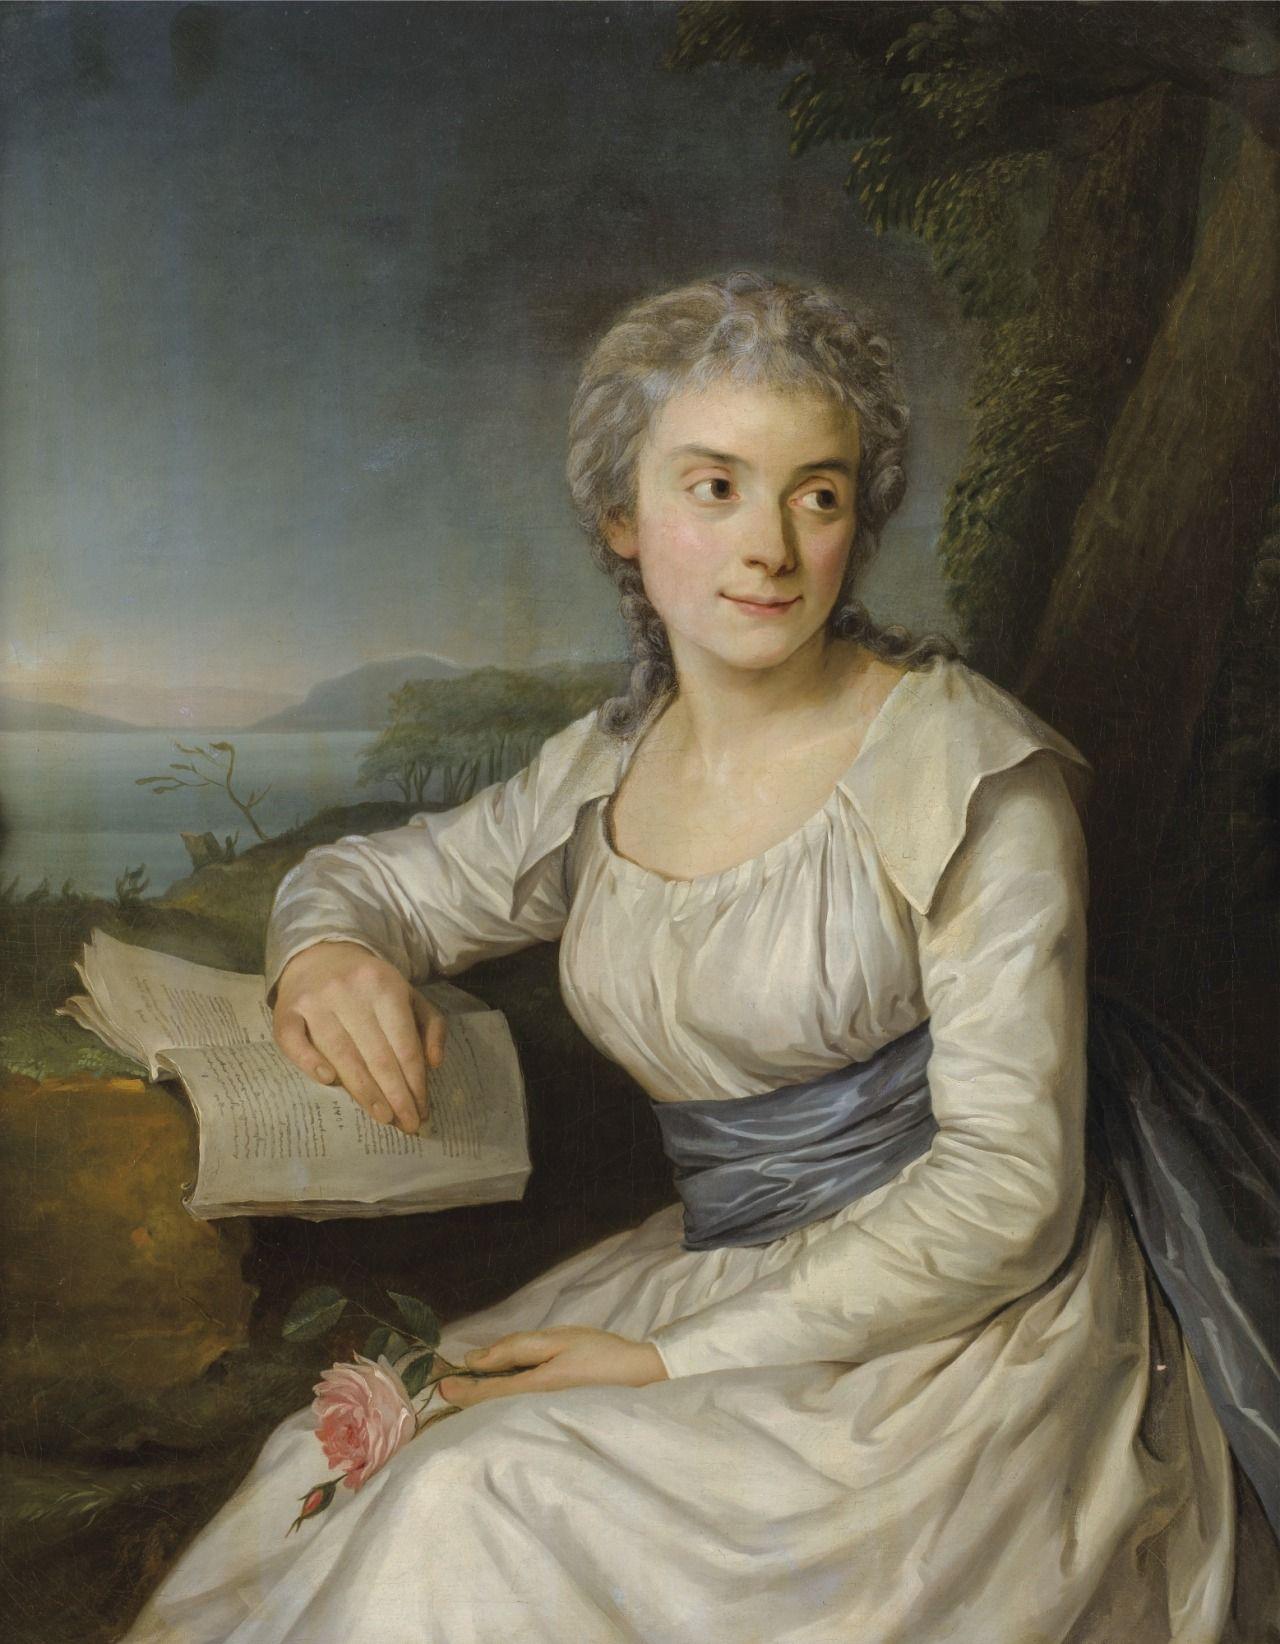 La comtesse de lameth n e marie anne de picot de bayonne - Peinture bayonne ...